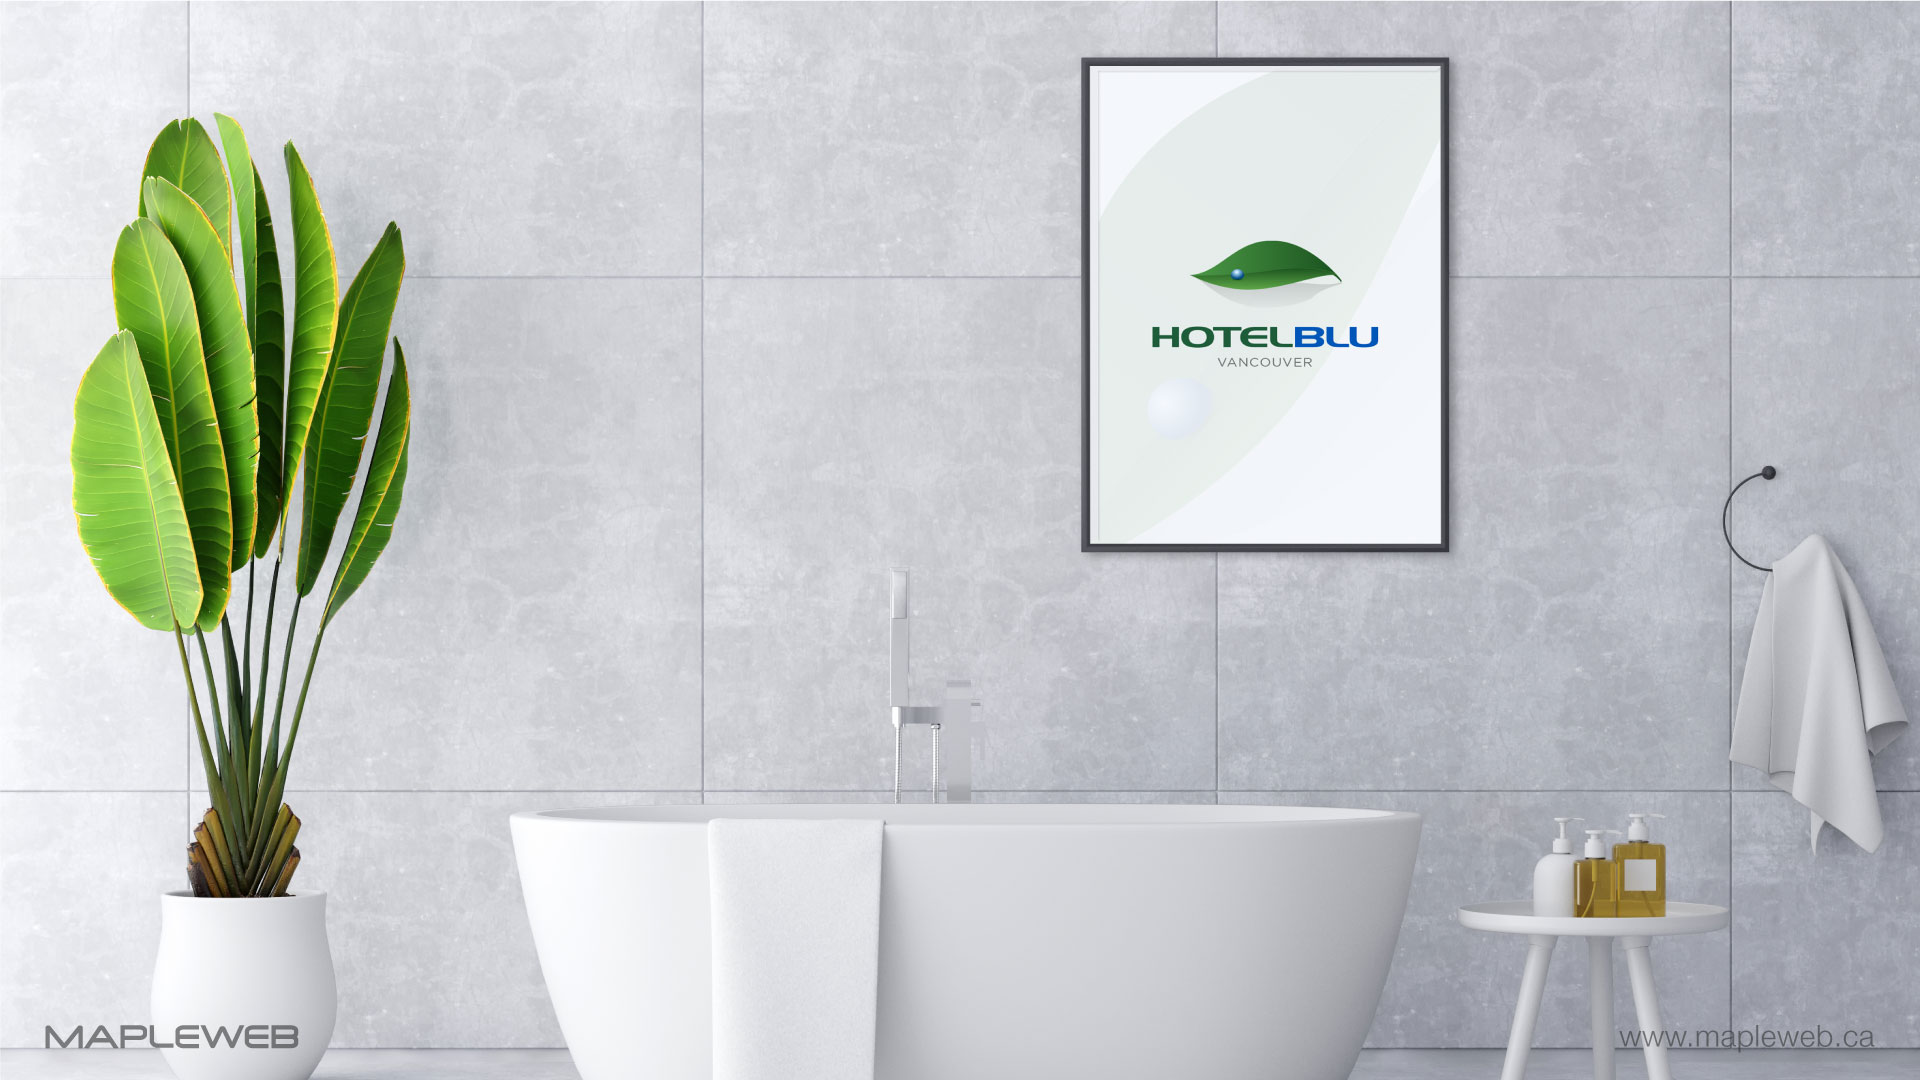 hotel-blu-brand-logo-design-by-mapleweb-vancouver-canada-bath-frame-mock